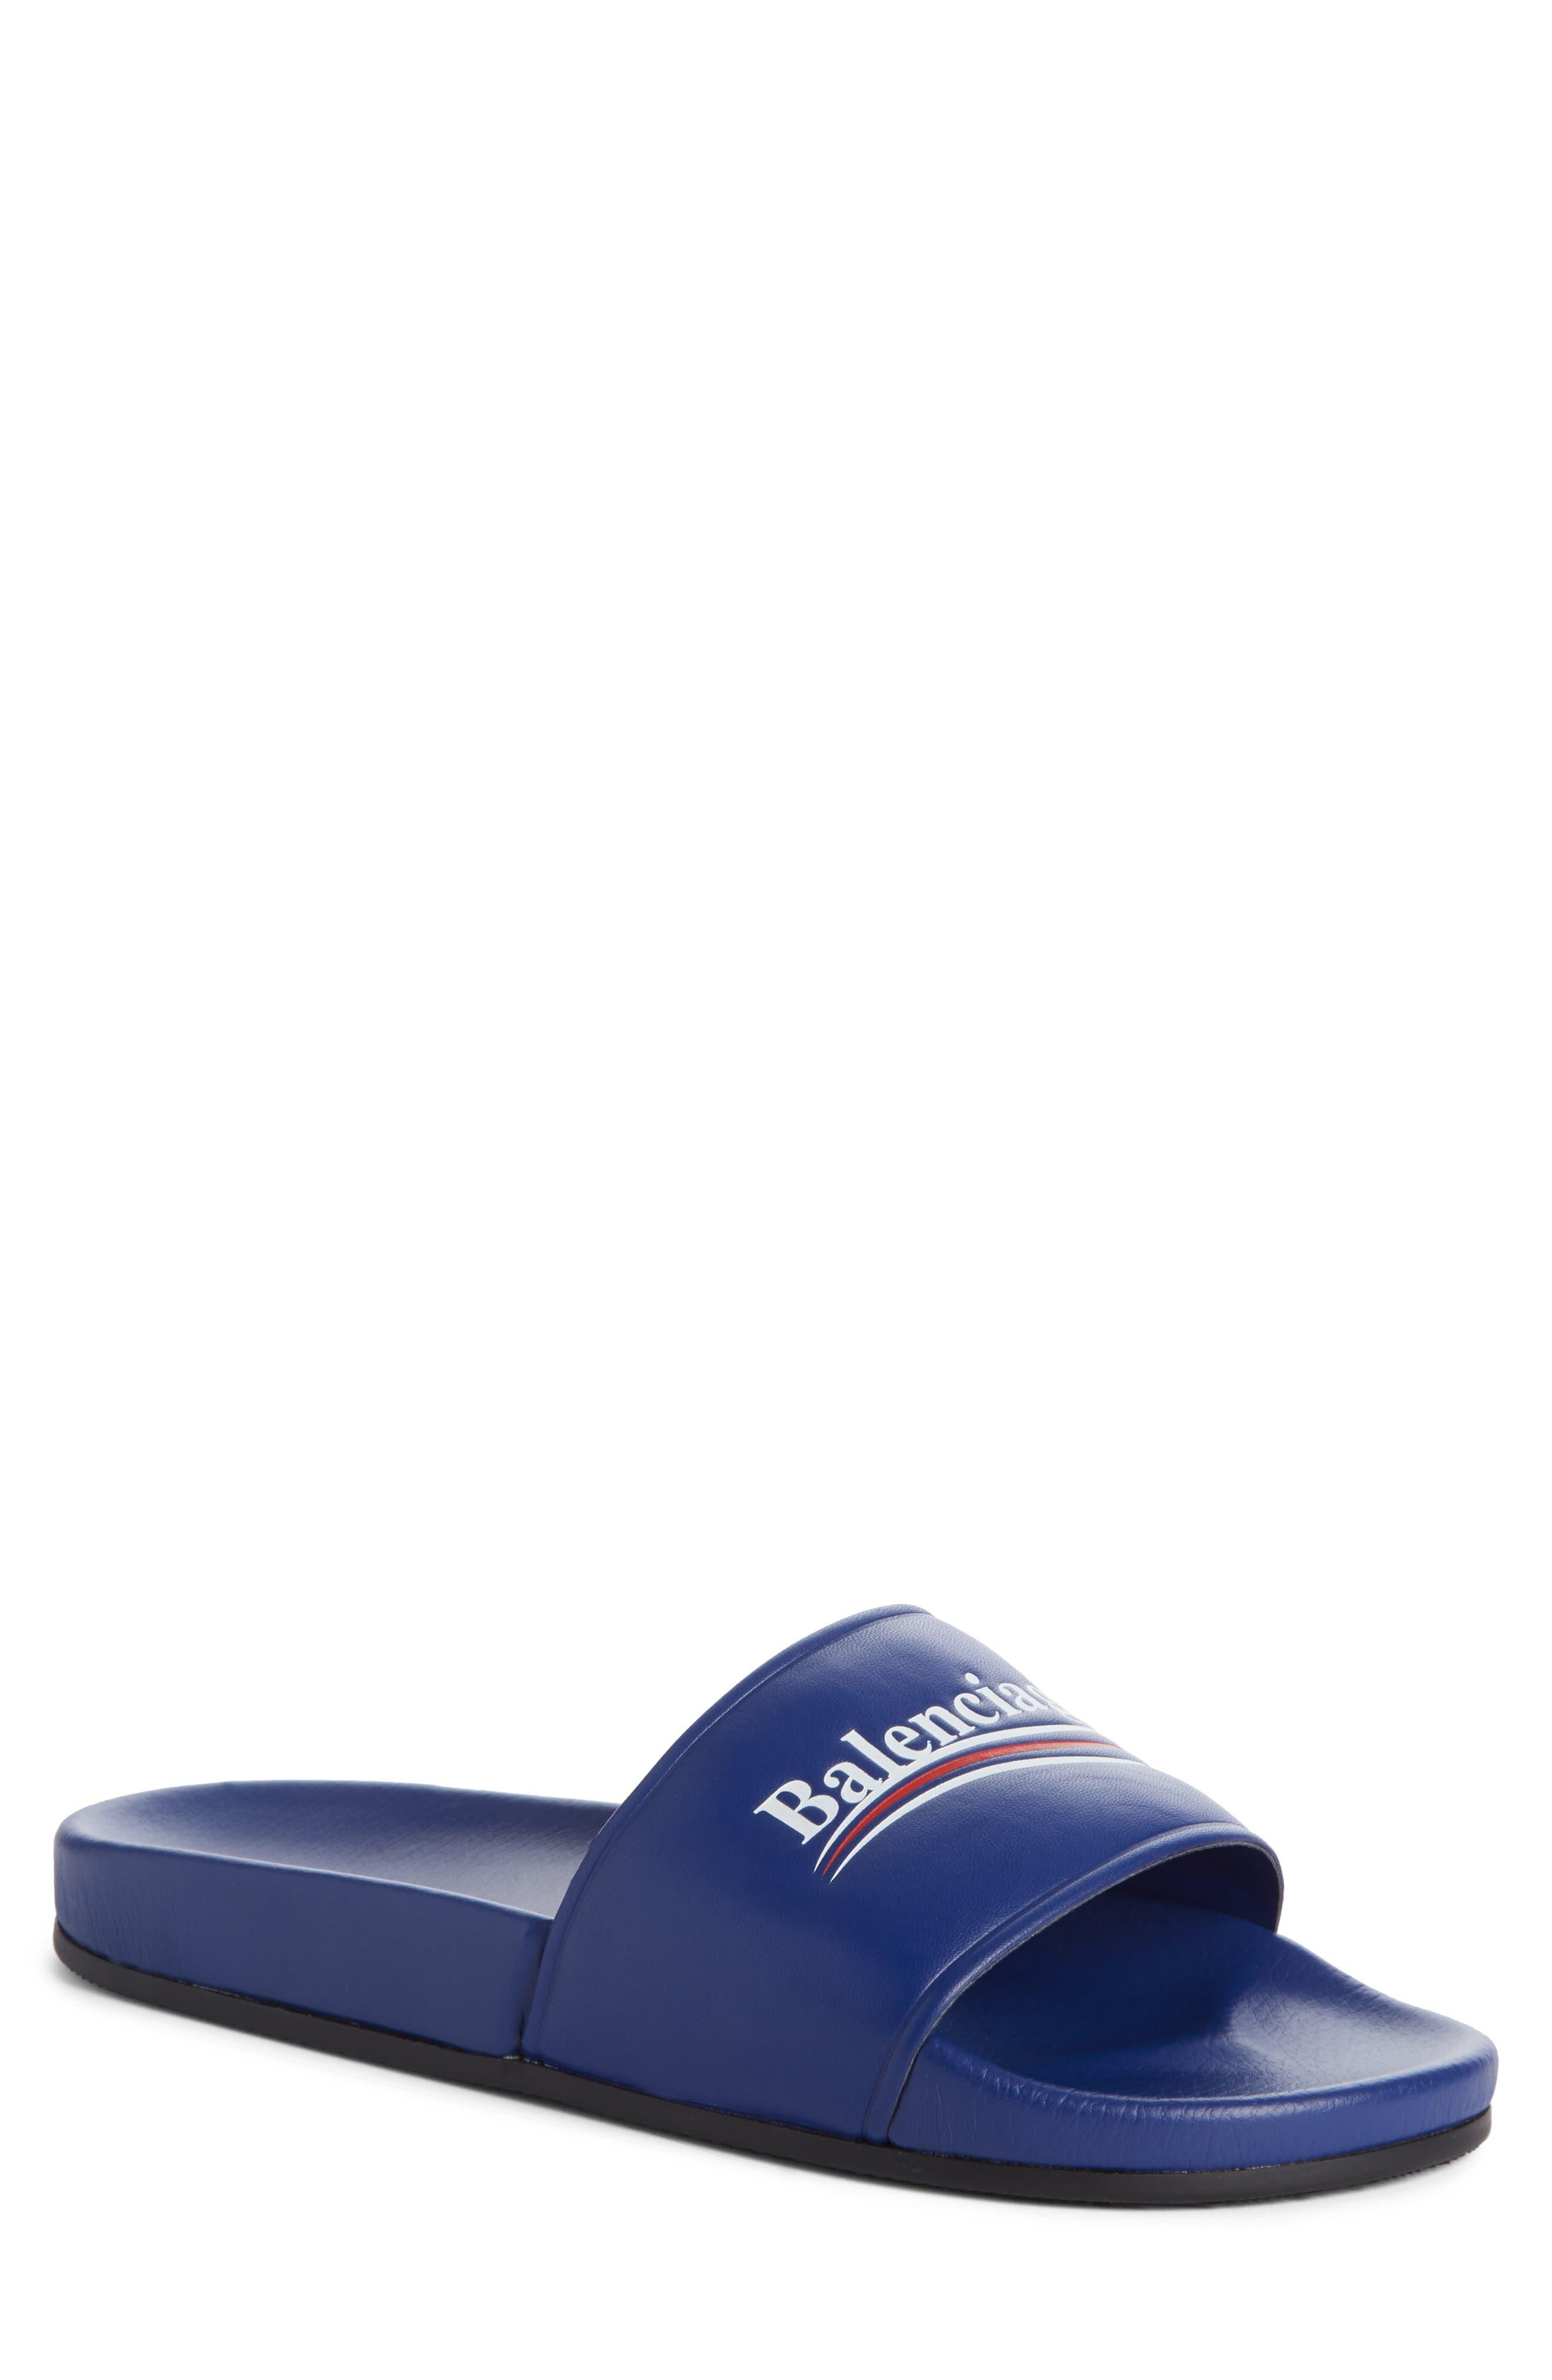 Alternate Image 1 Selected - Balenciaga Retro Logo Slide Sandal (Men)